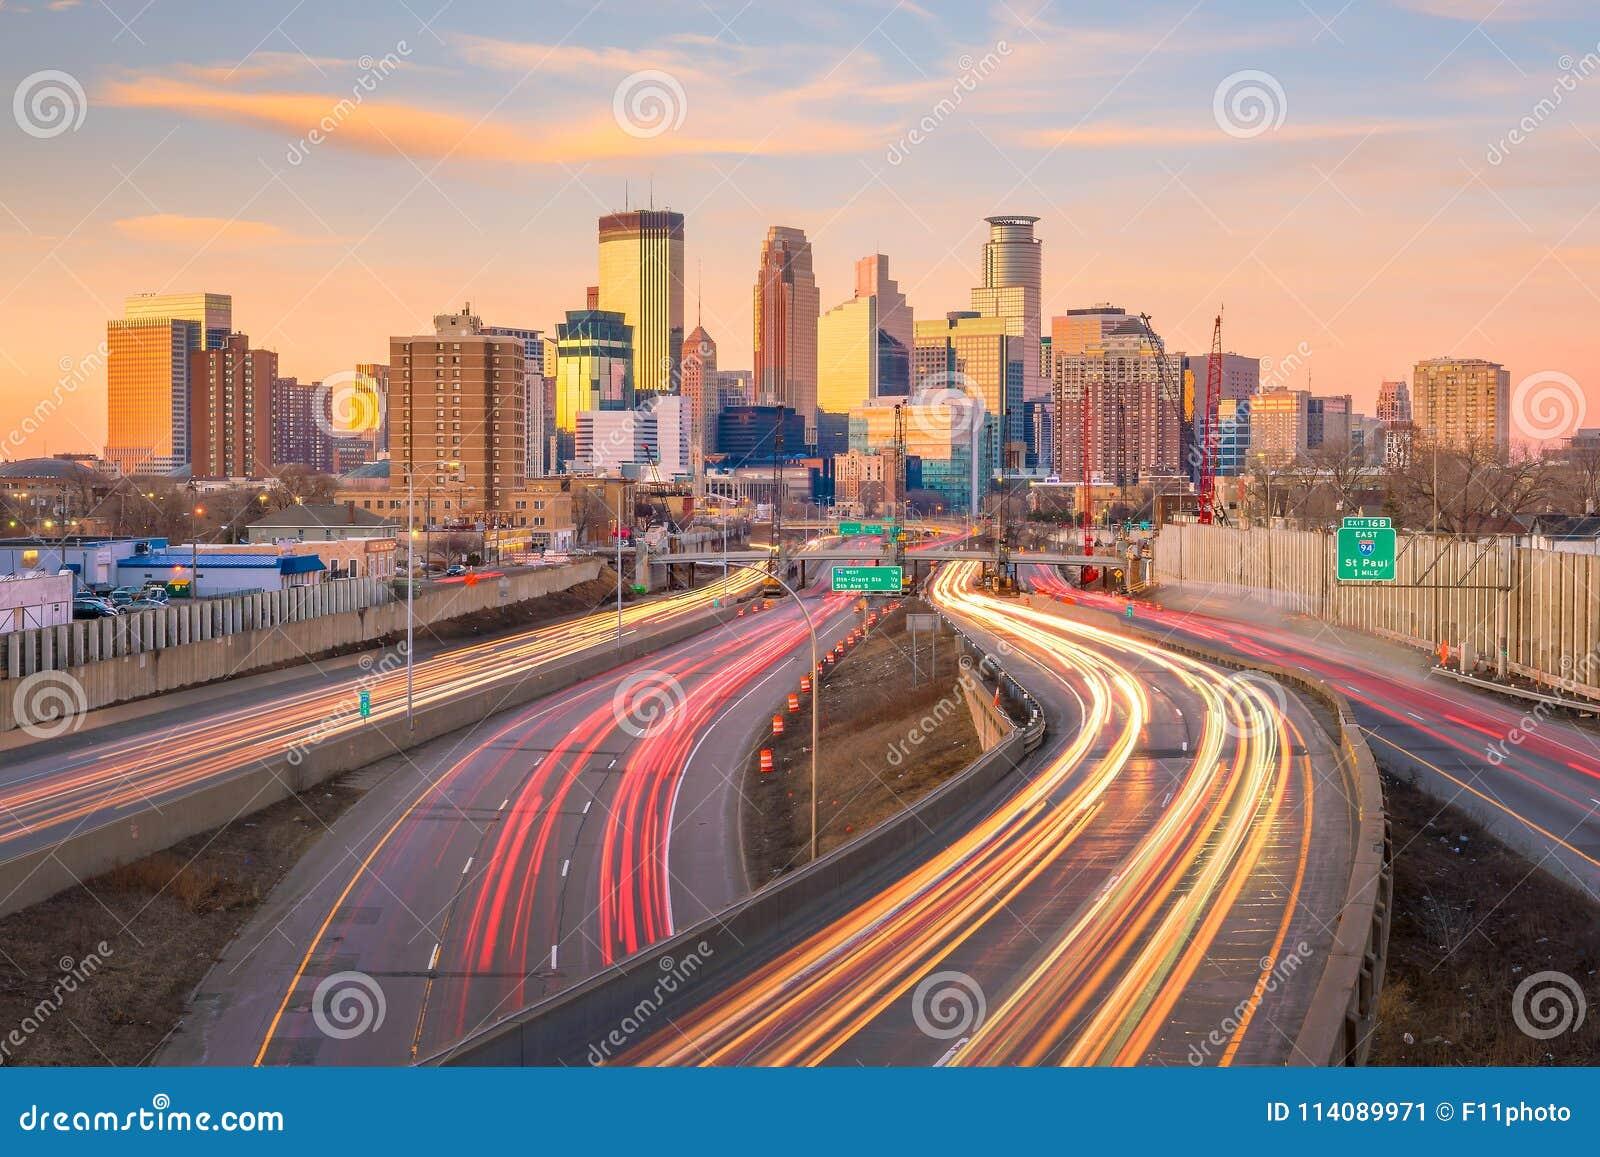 Im Stadtzentrum gelegene Skyline Minneapolis in Minnesota, USA